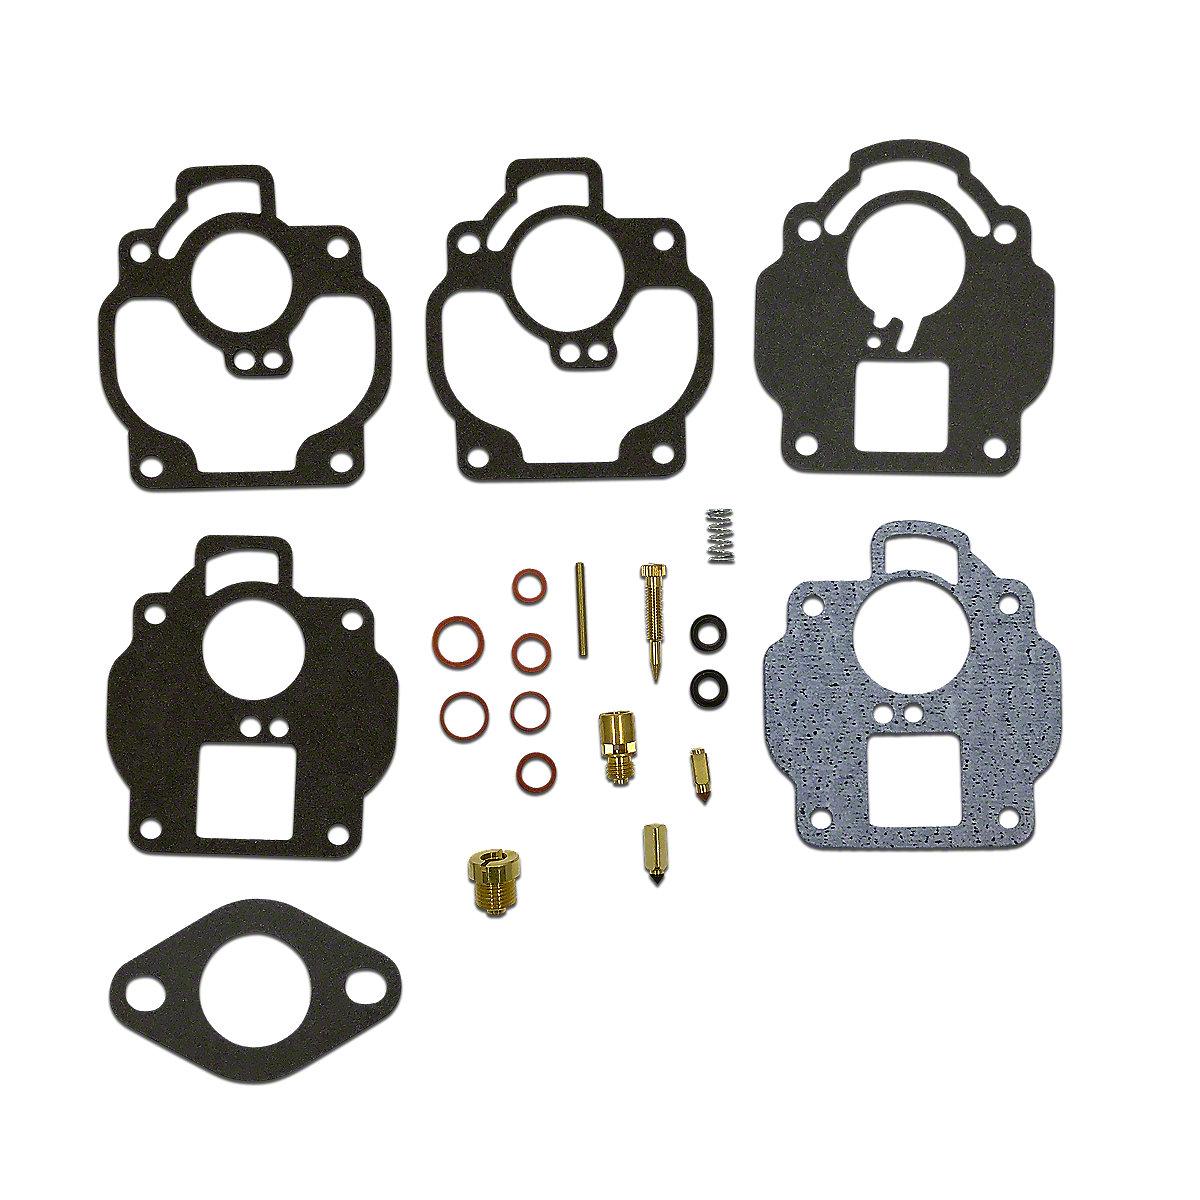 ABC3933Economy Carburetor Kit for Carter Carburetors